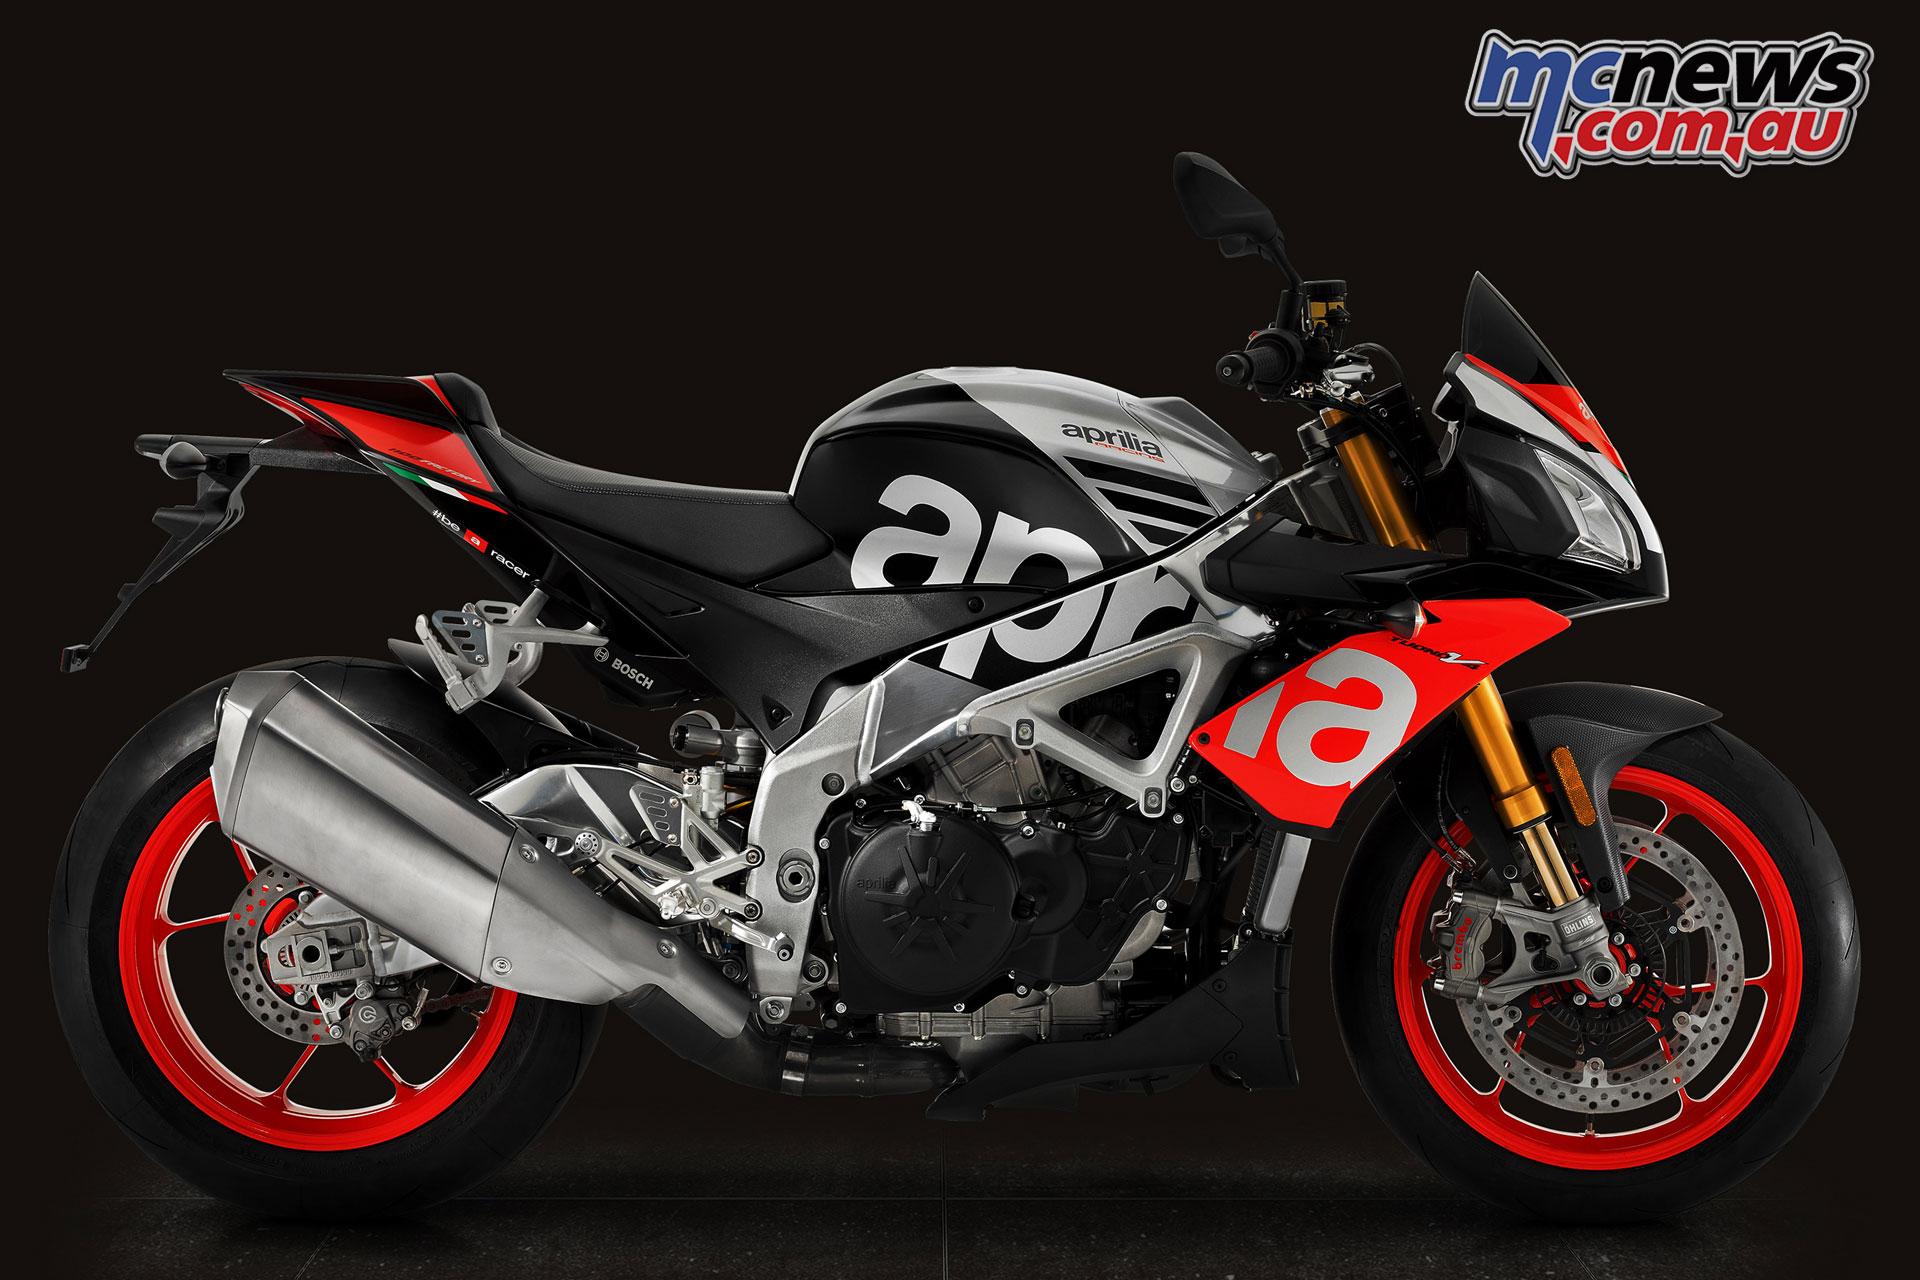 2018 Aprilia Tuono V4 1100 Factory V4 1100 Rr Motorcycle News Sport And Reviews